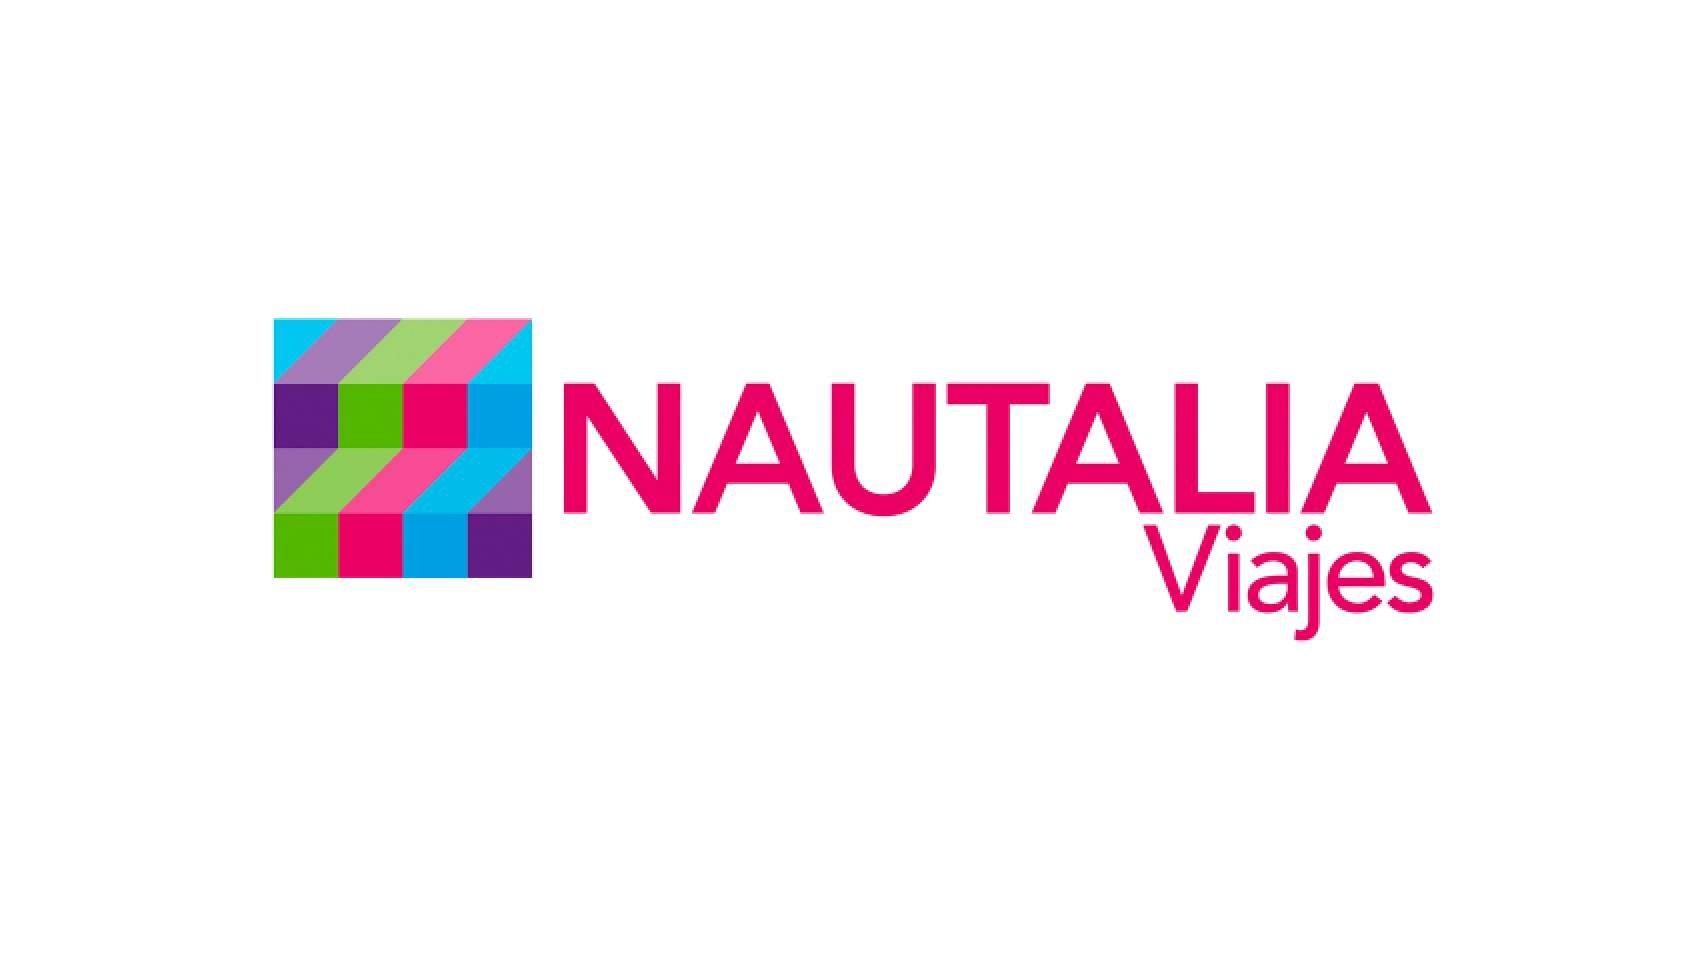 Nautalia busca agente de viajes en Pamplona